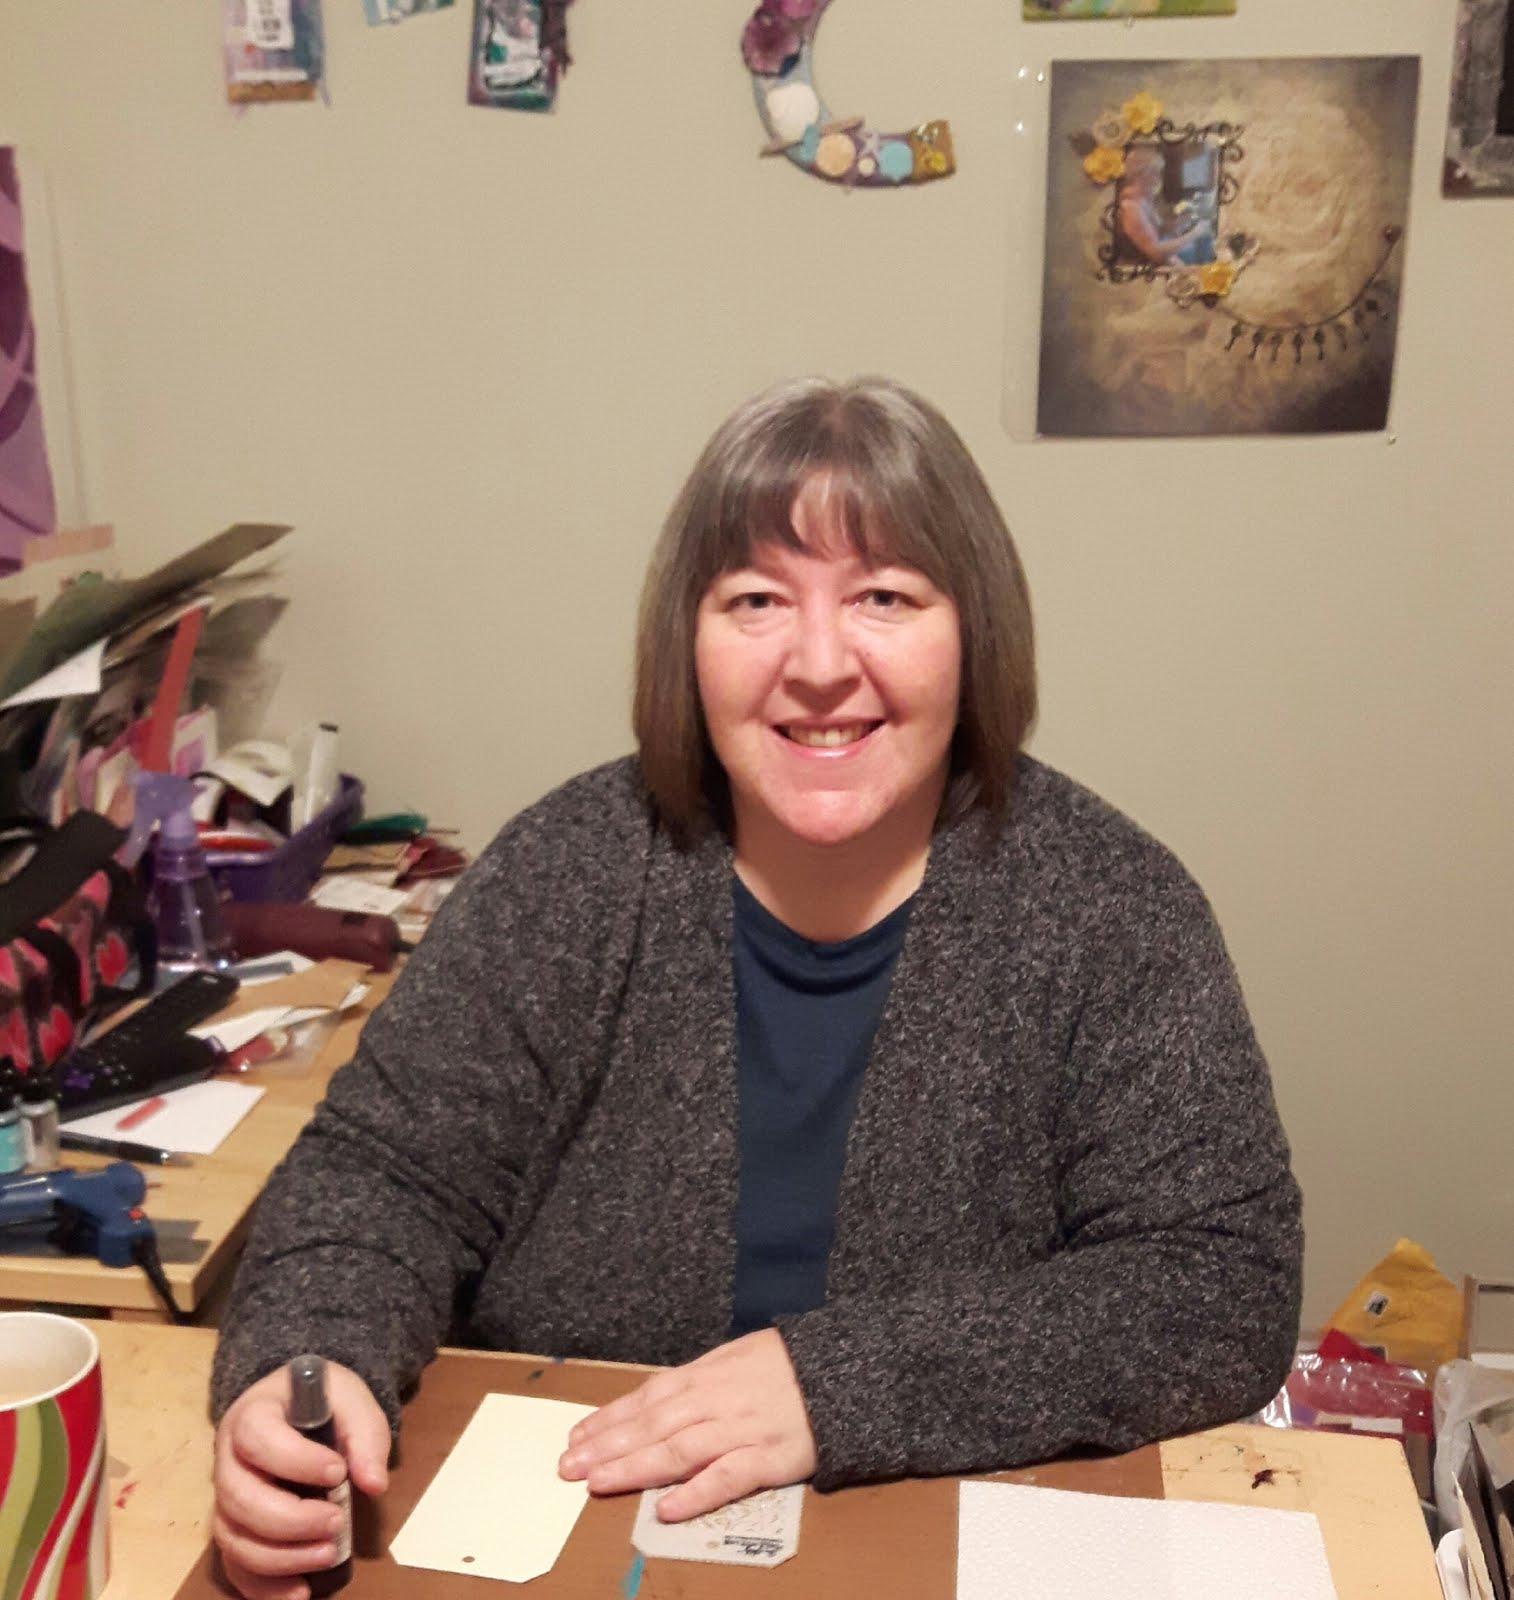 Cathy Potosky